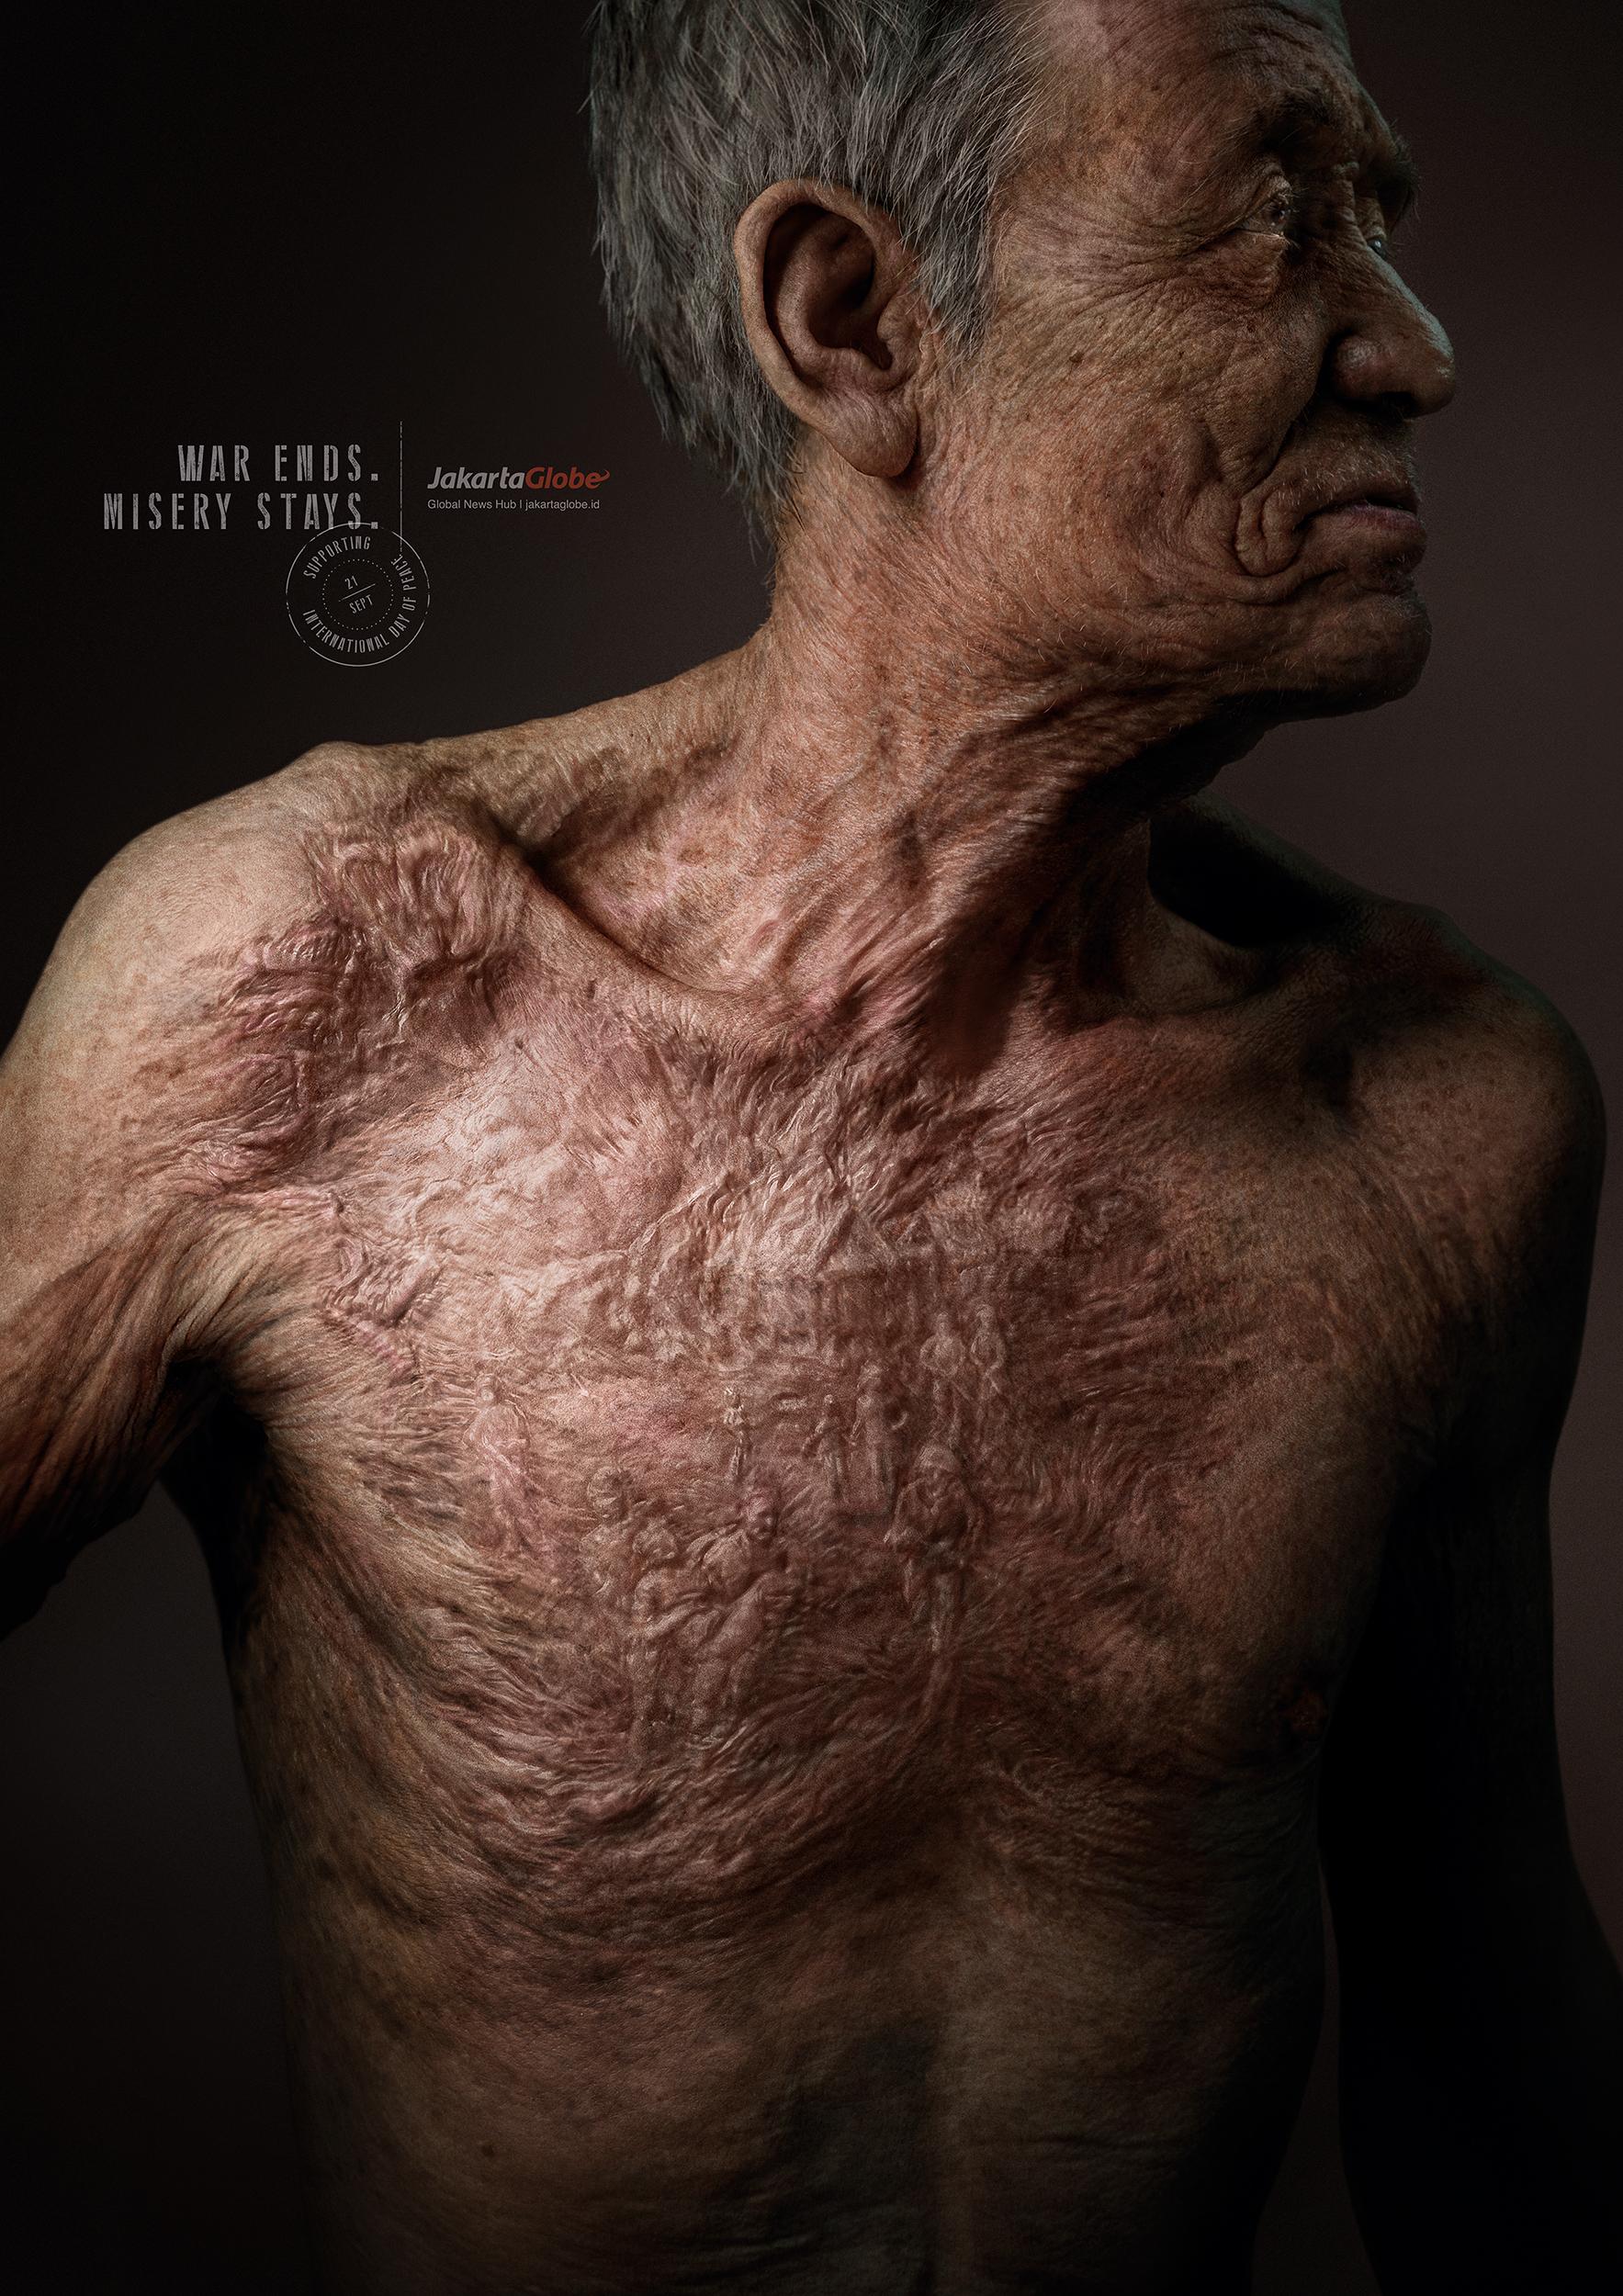 Scars of Misery_Old Man_Nic_1_sRGB.jpg